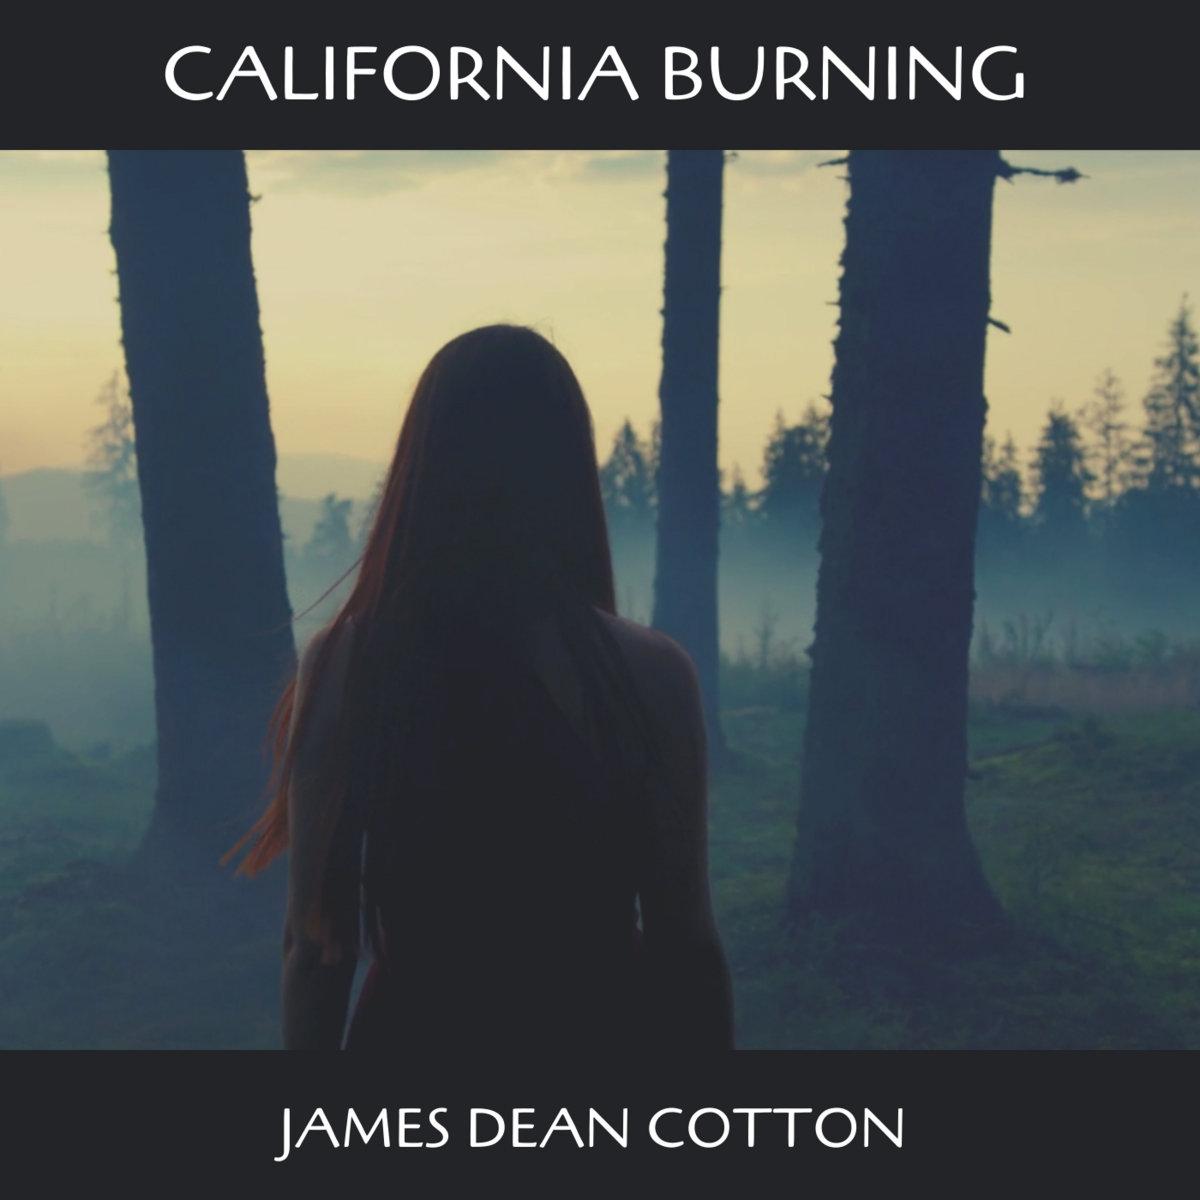 California Burning by James Dean Cotton